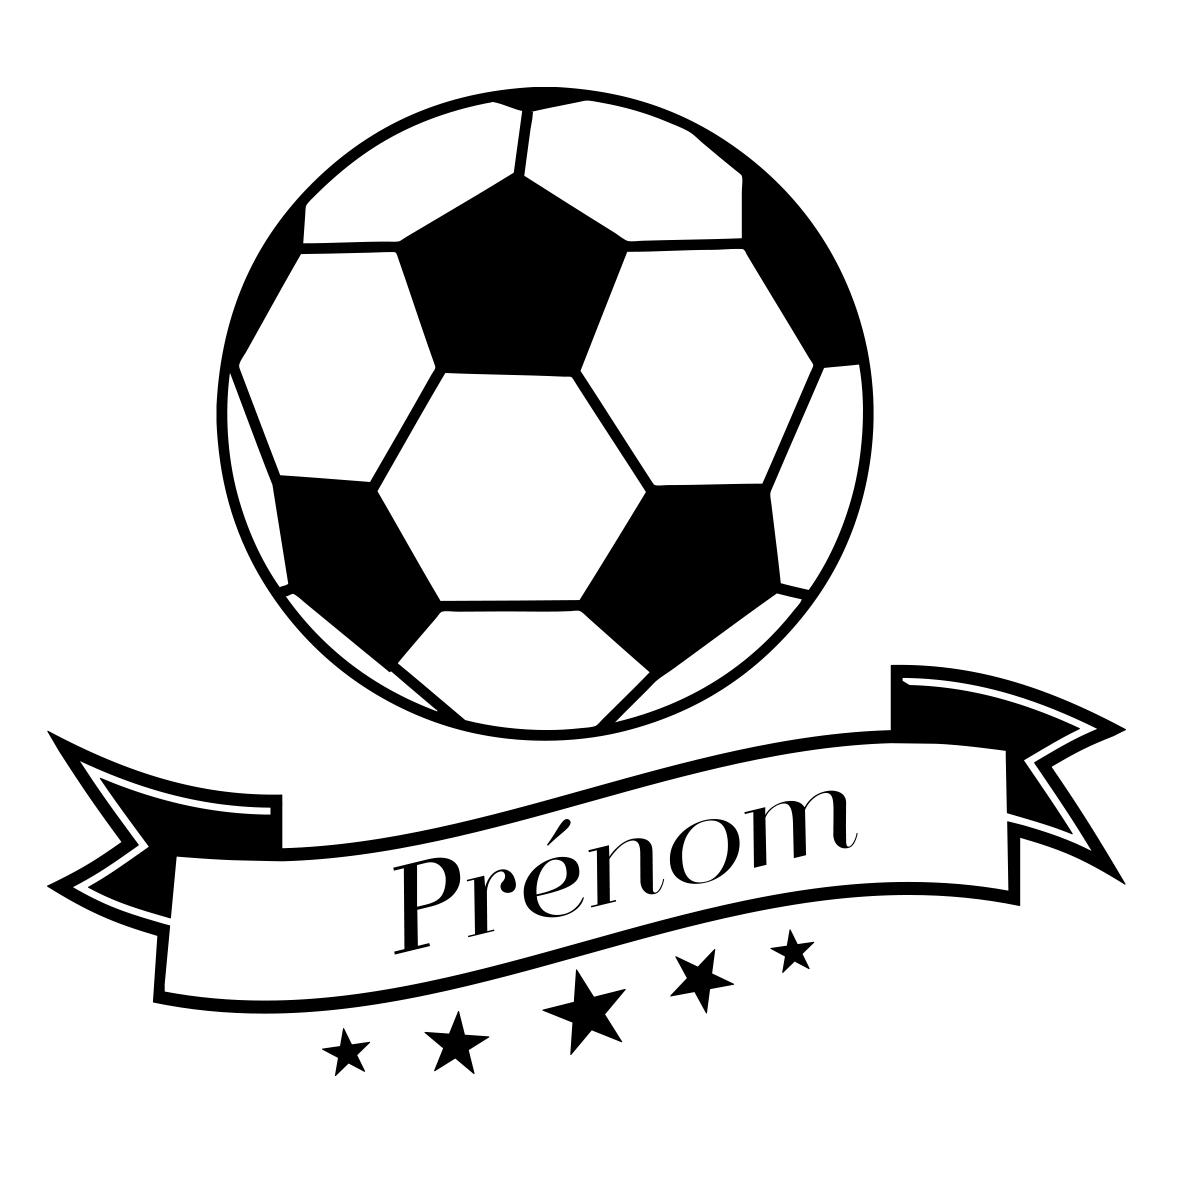 Sticker pr nom personnalisable ballon de foot stickers - Dessin ballon foot ...